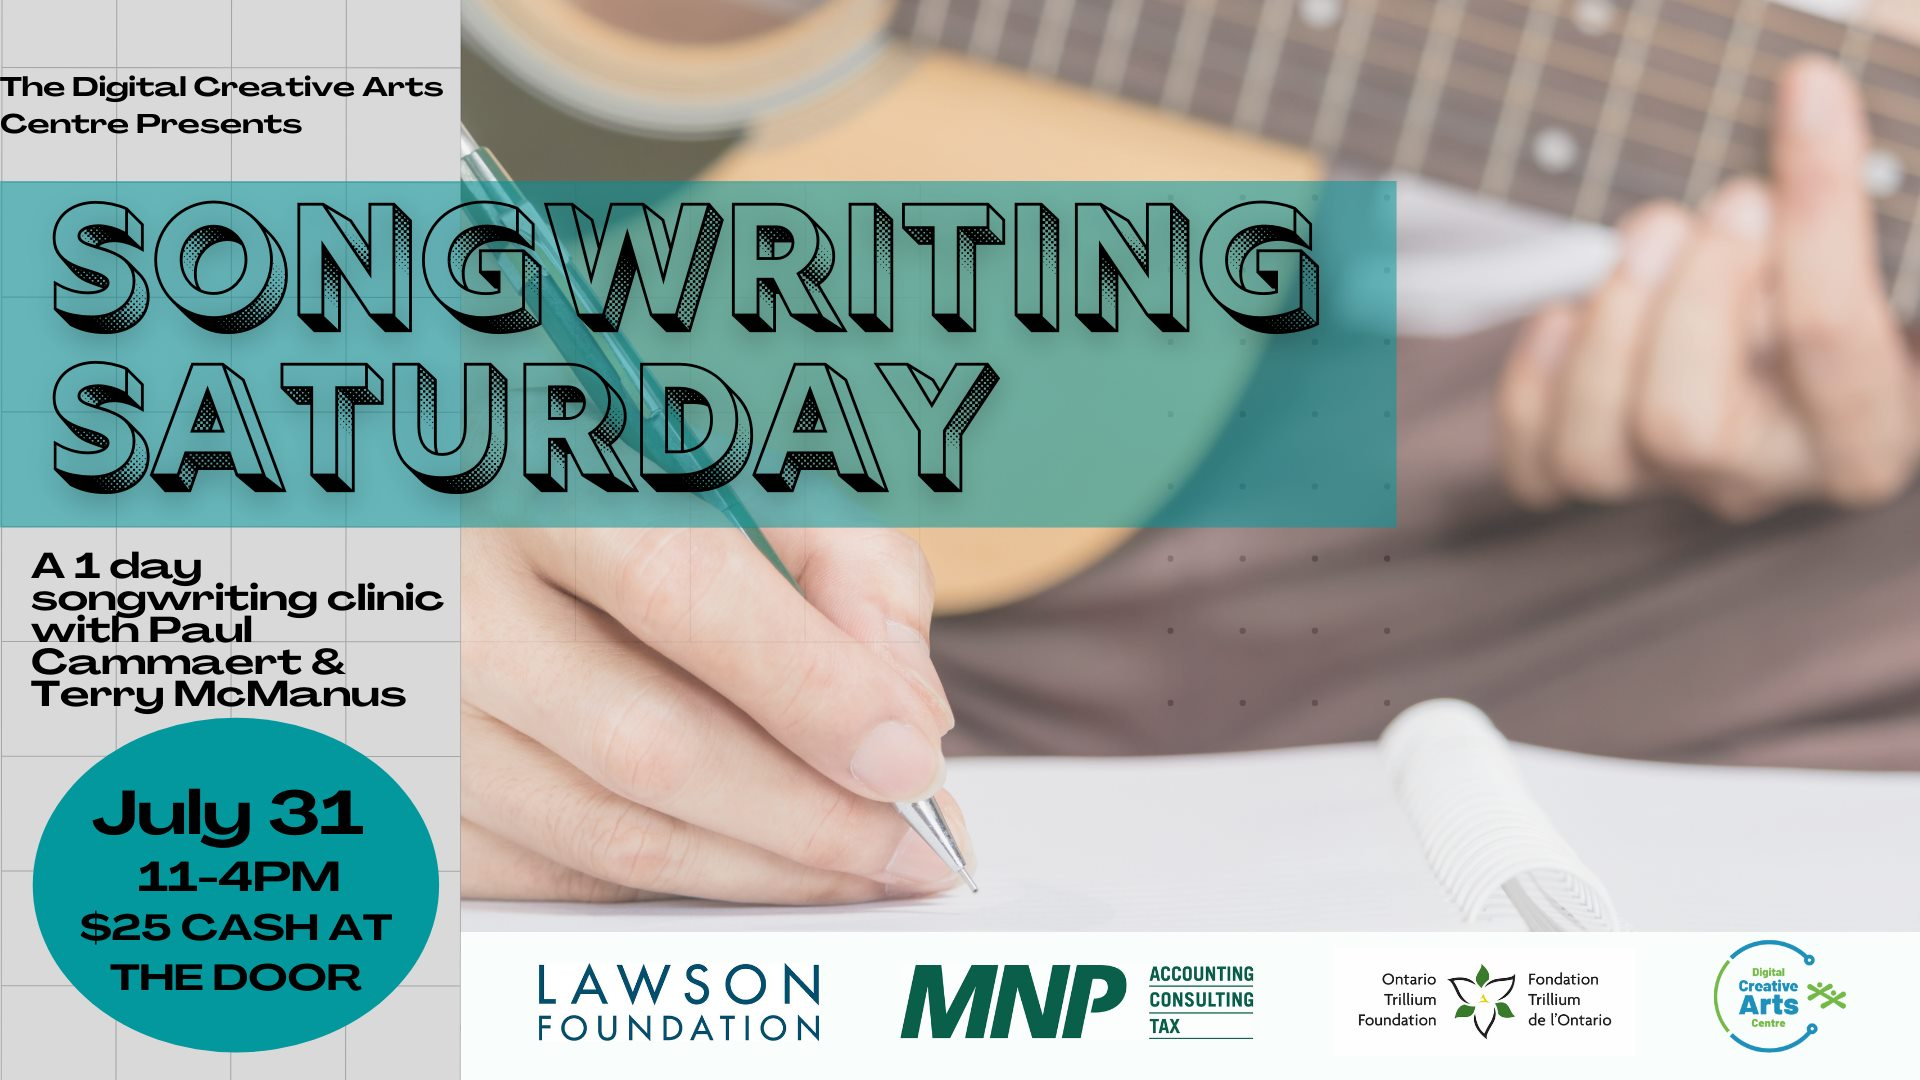 Songwriting Saturday